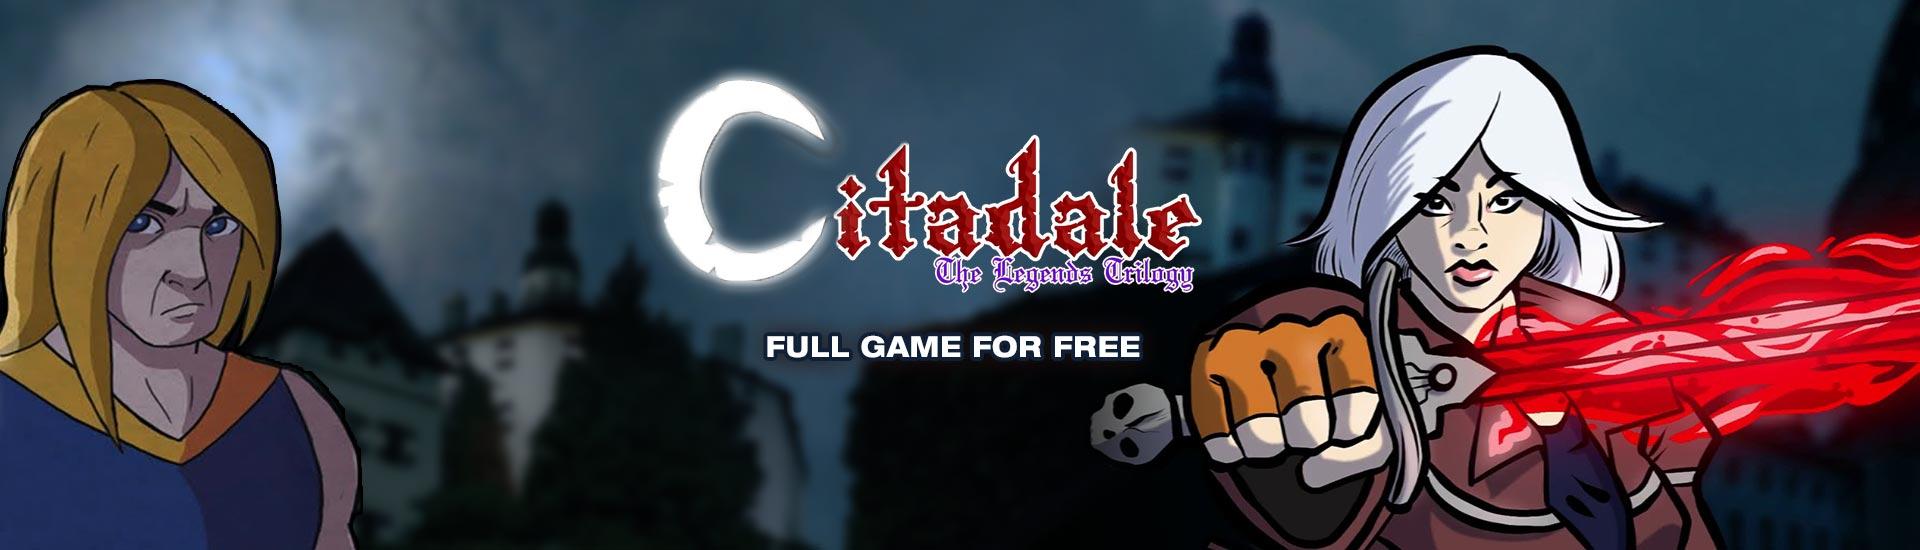 Gratis game Citadale: The Legends Trilogy @Indiegala